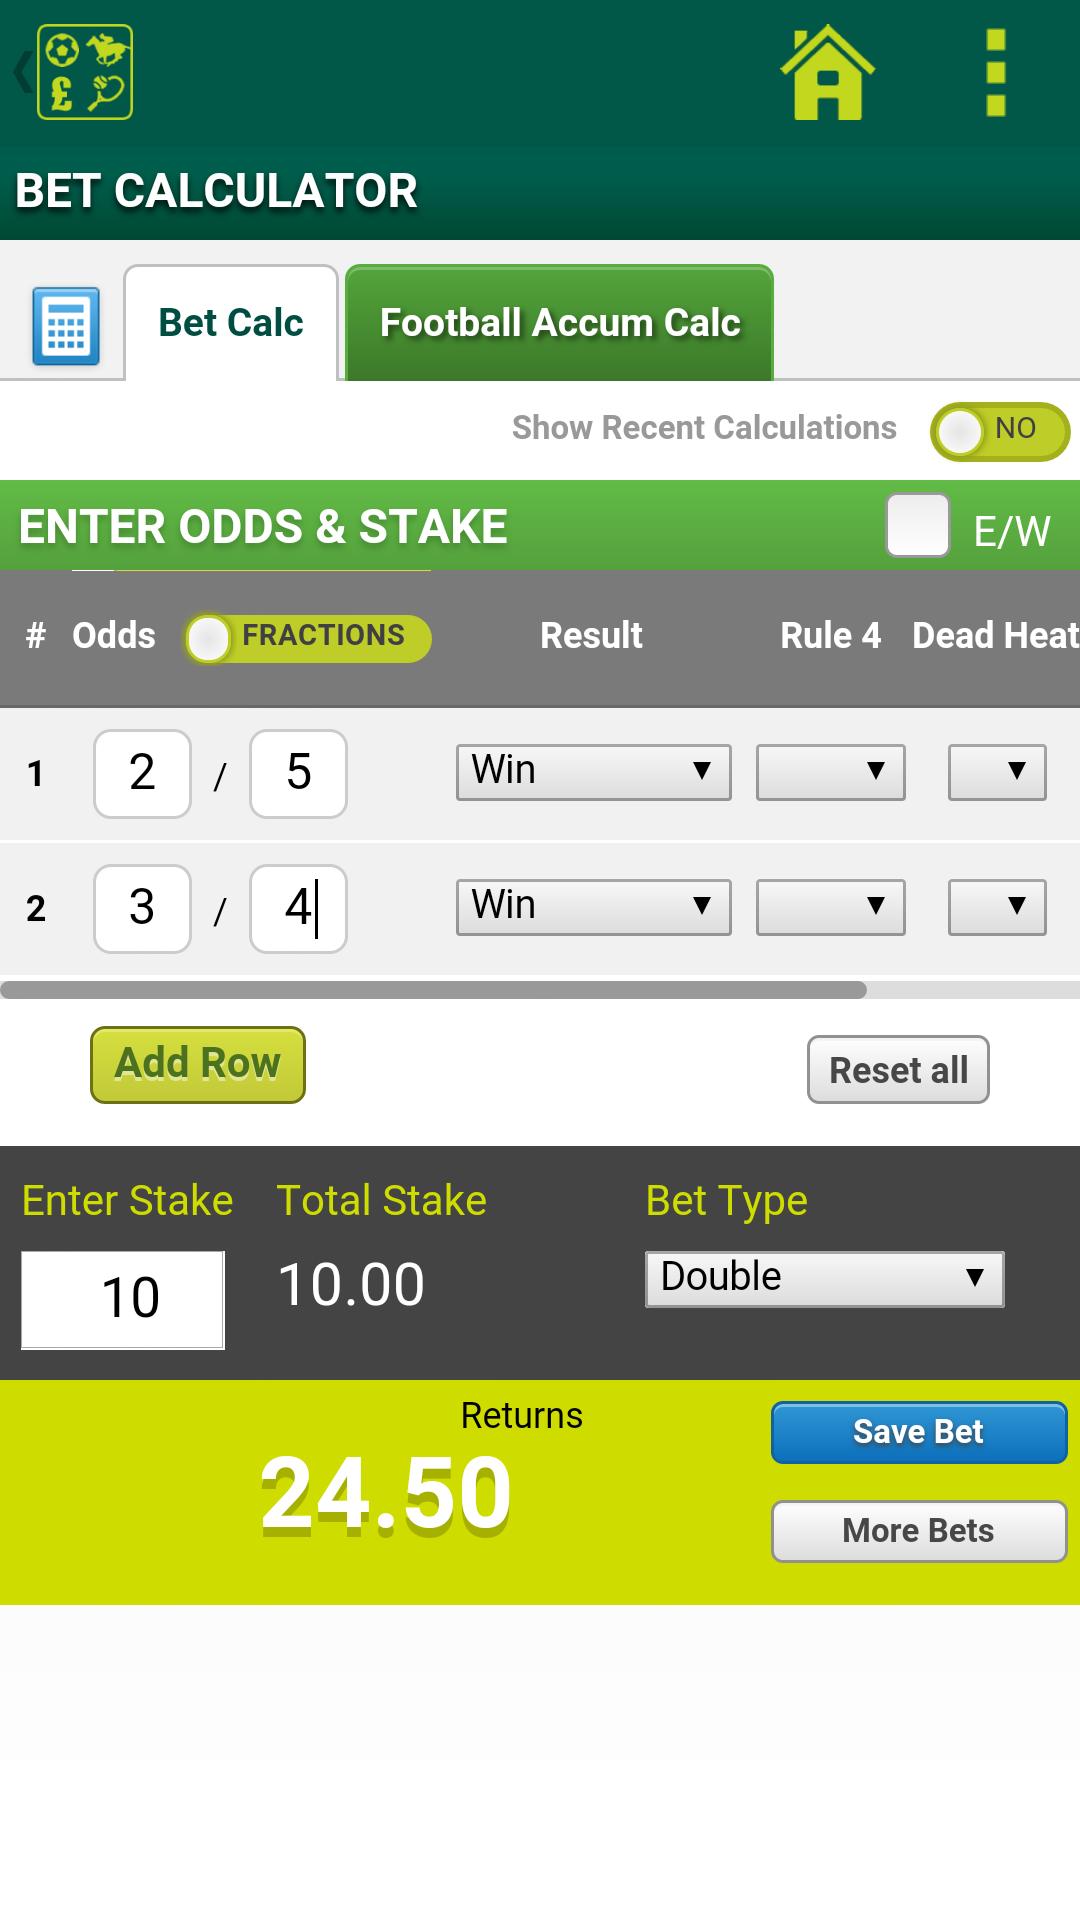 Stan james betting calculator paddy paddy power referendum betting on sports